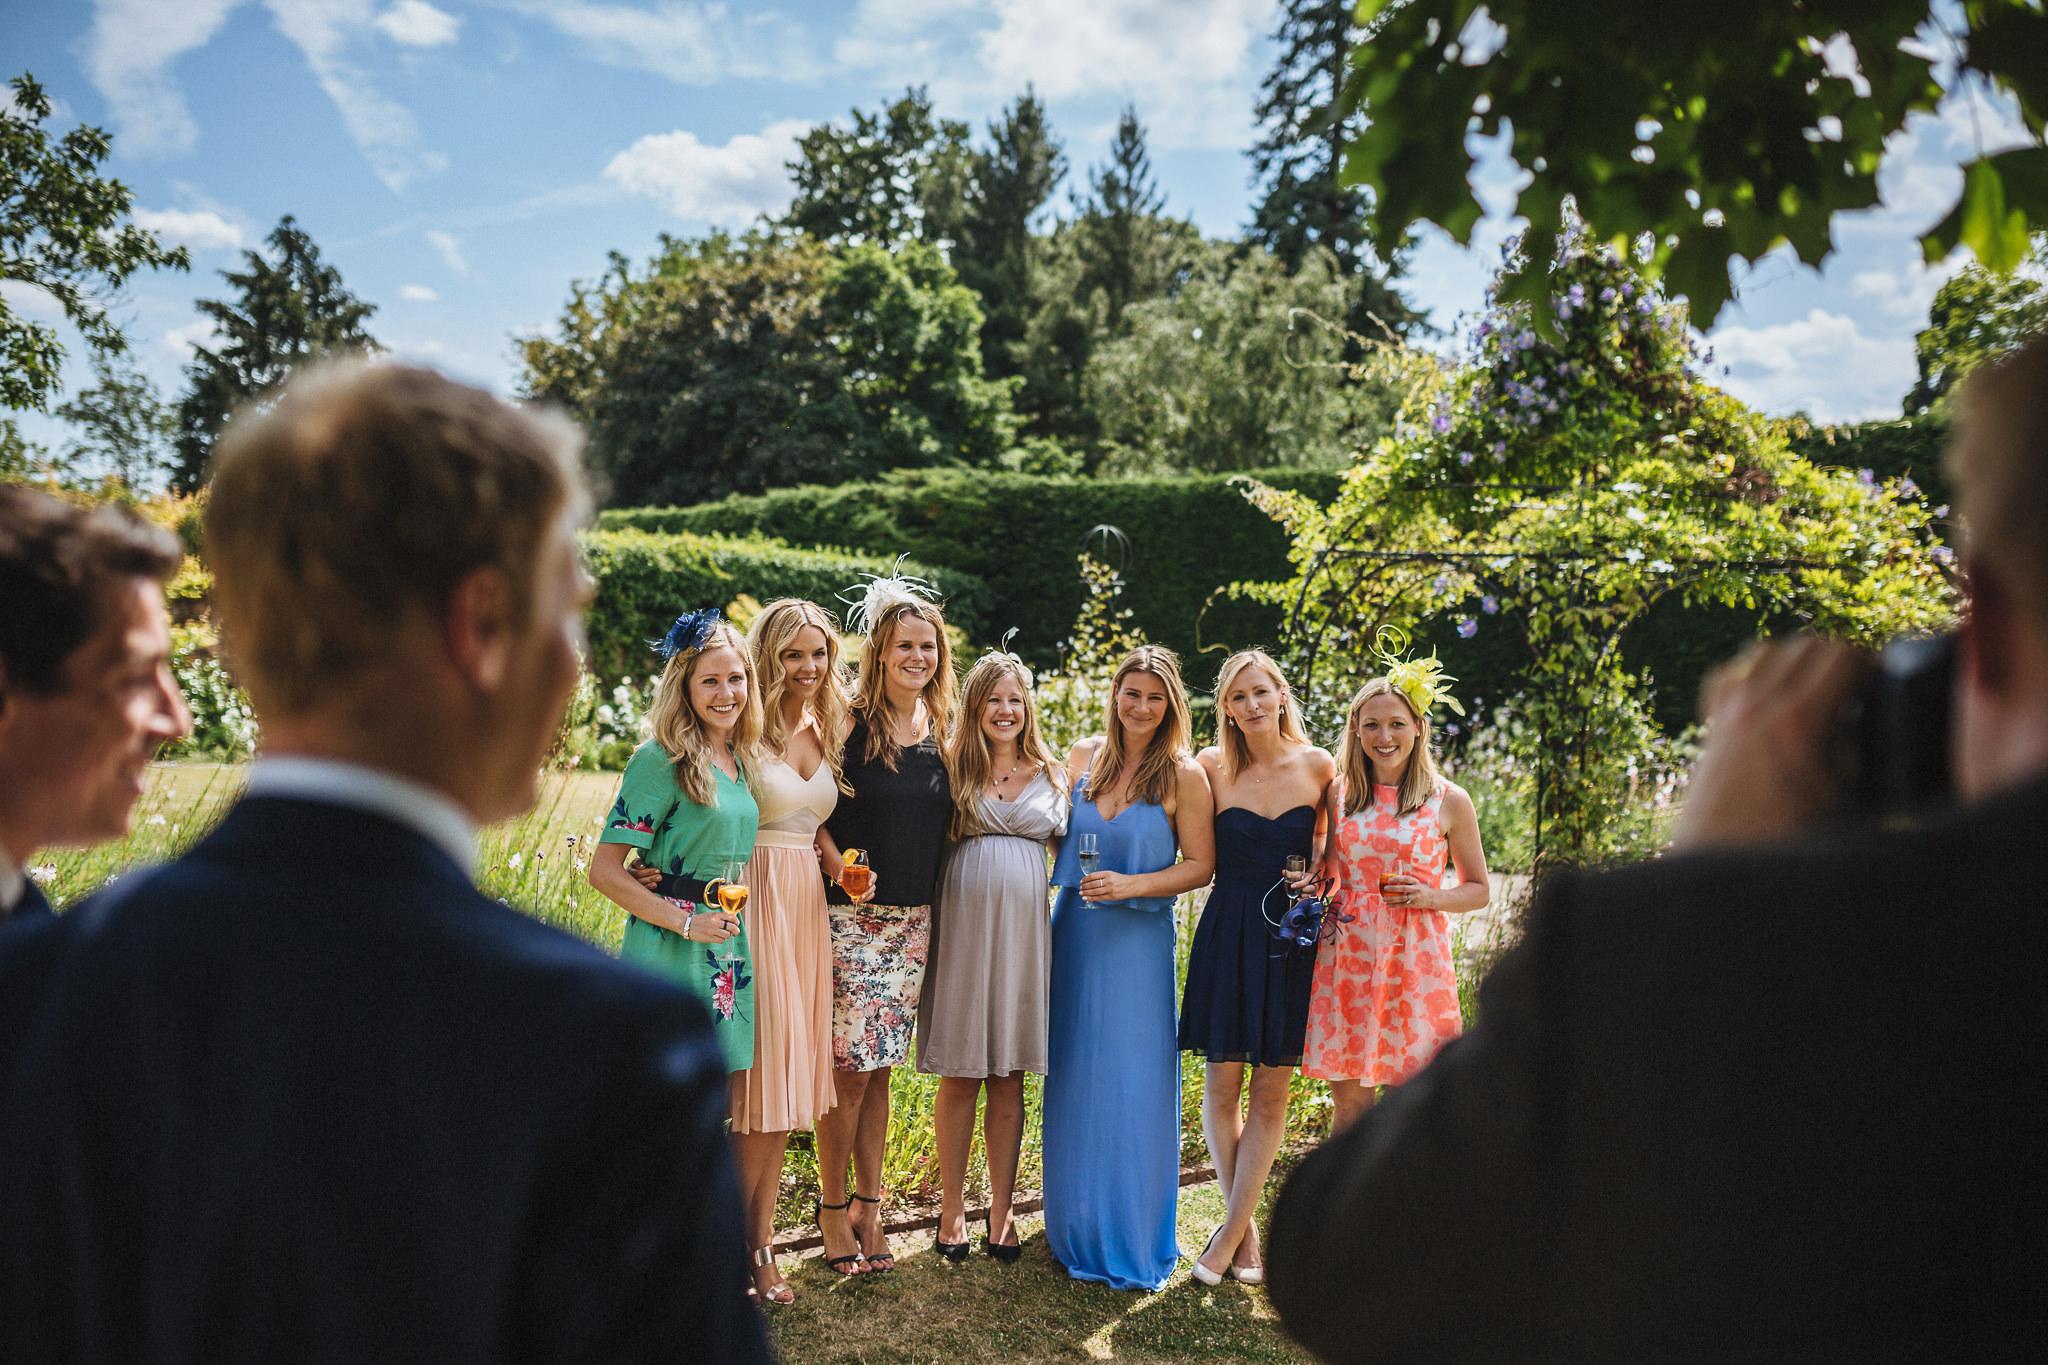 paul-marbrook-Gaynes-Park Wedding-Photographer-90070